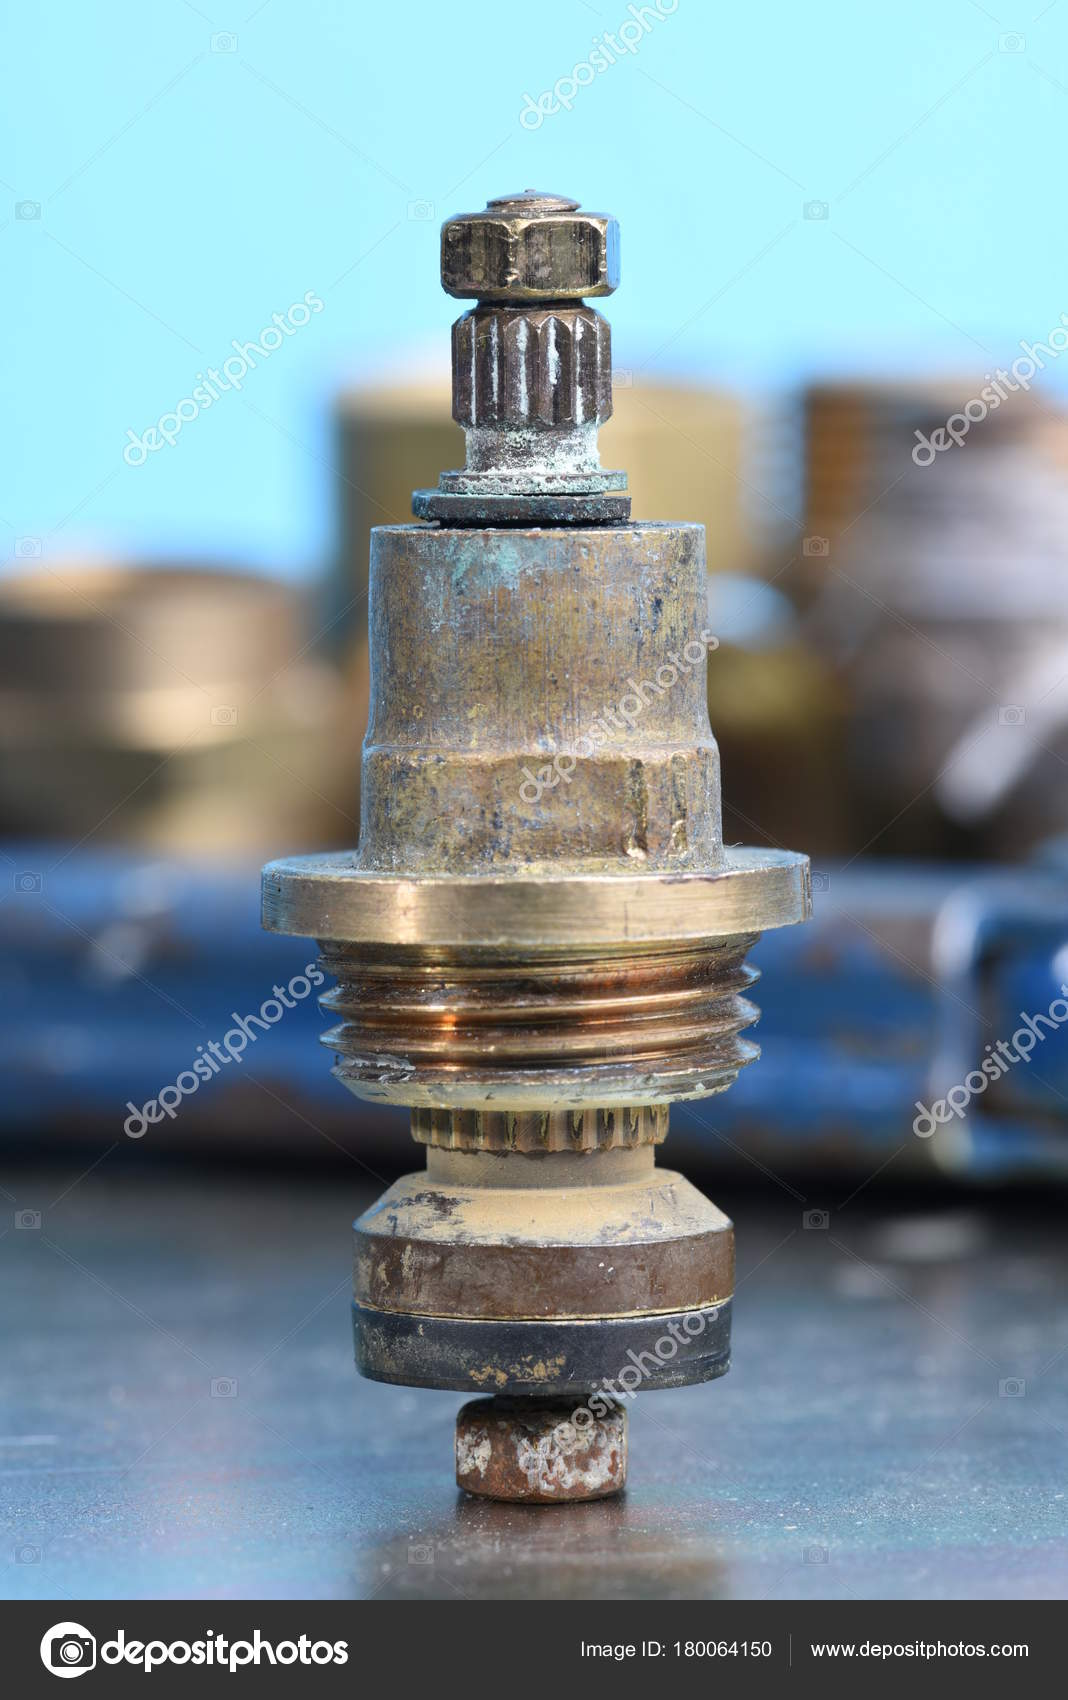 Plumbing Parts Repair Old Brass Tap Valve Tools — Stock Photo ...